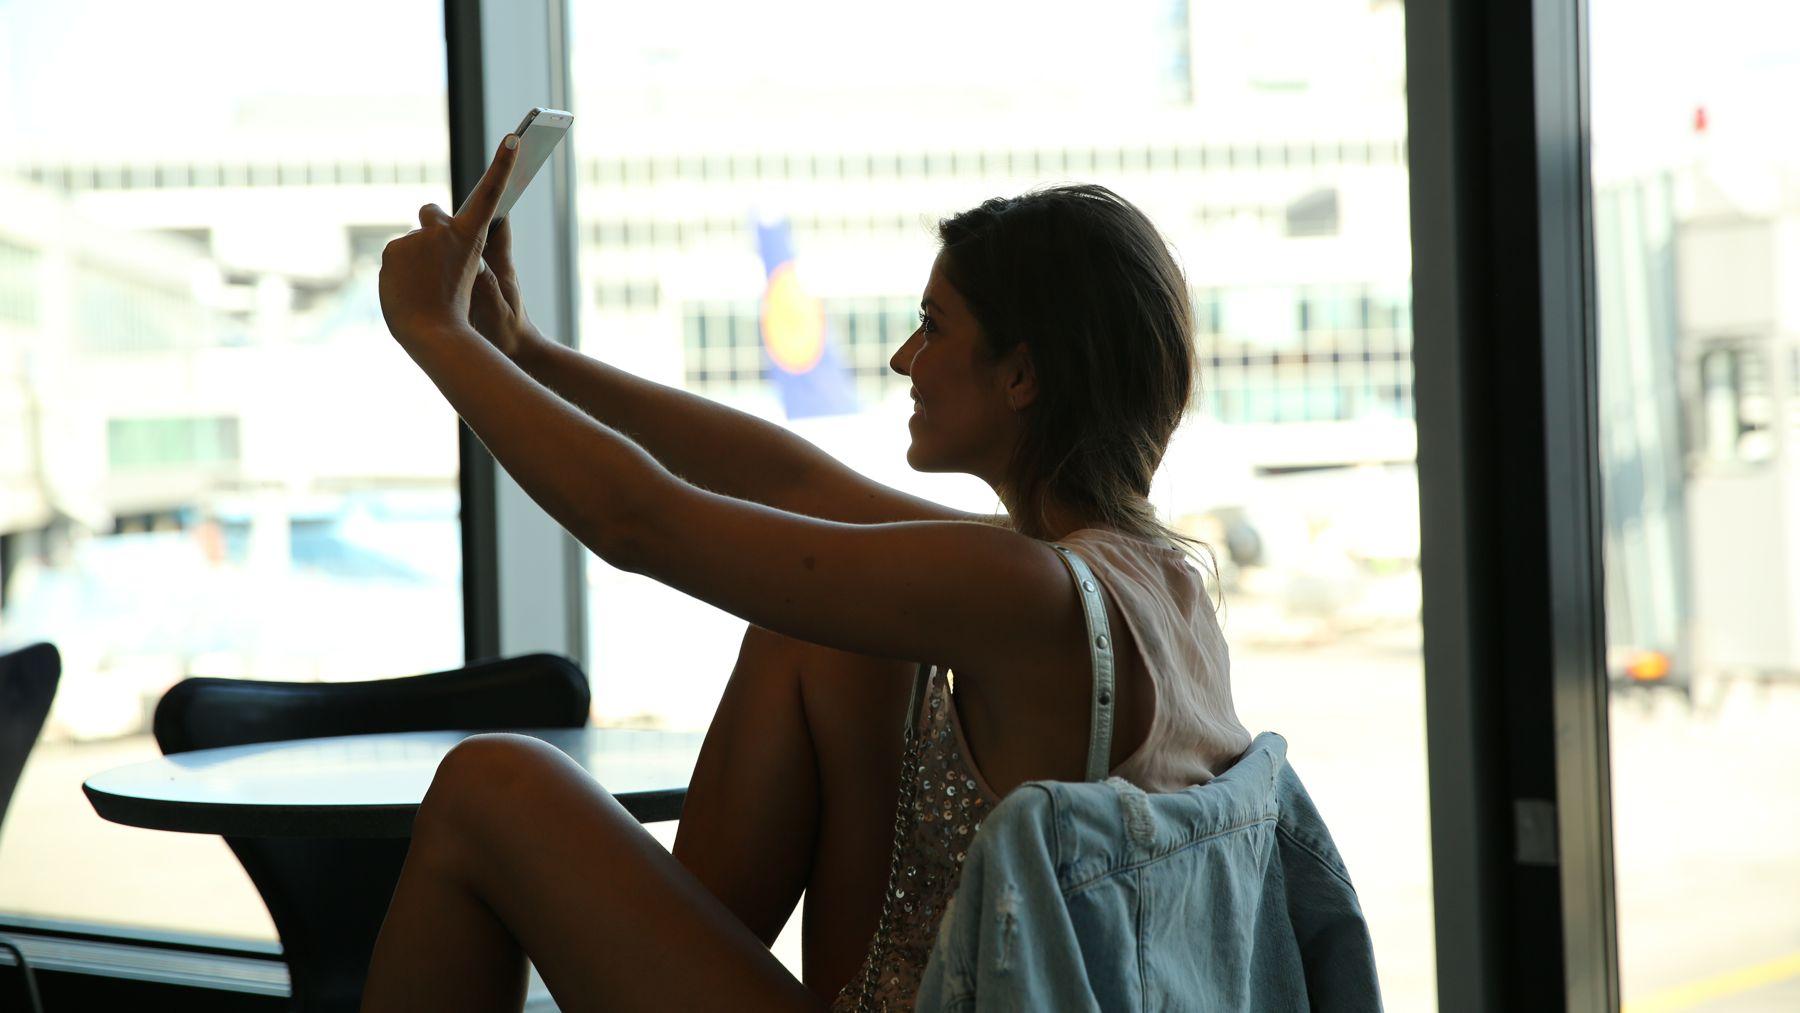 trendy_taste-look-outfit-street_style-ootd-blog-blogger-fashion_spain-moda_españa-traveling-viaje-frankfurt-stan_smith-adidas-lentejuelas-top-denim-shorts-vaqueros_rotos-21